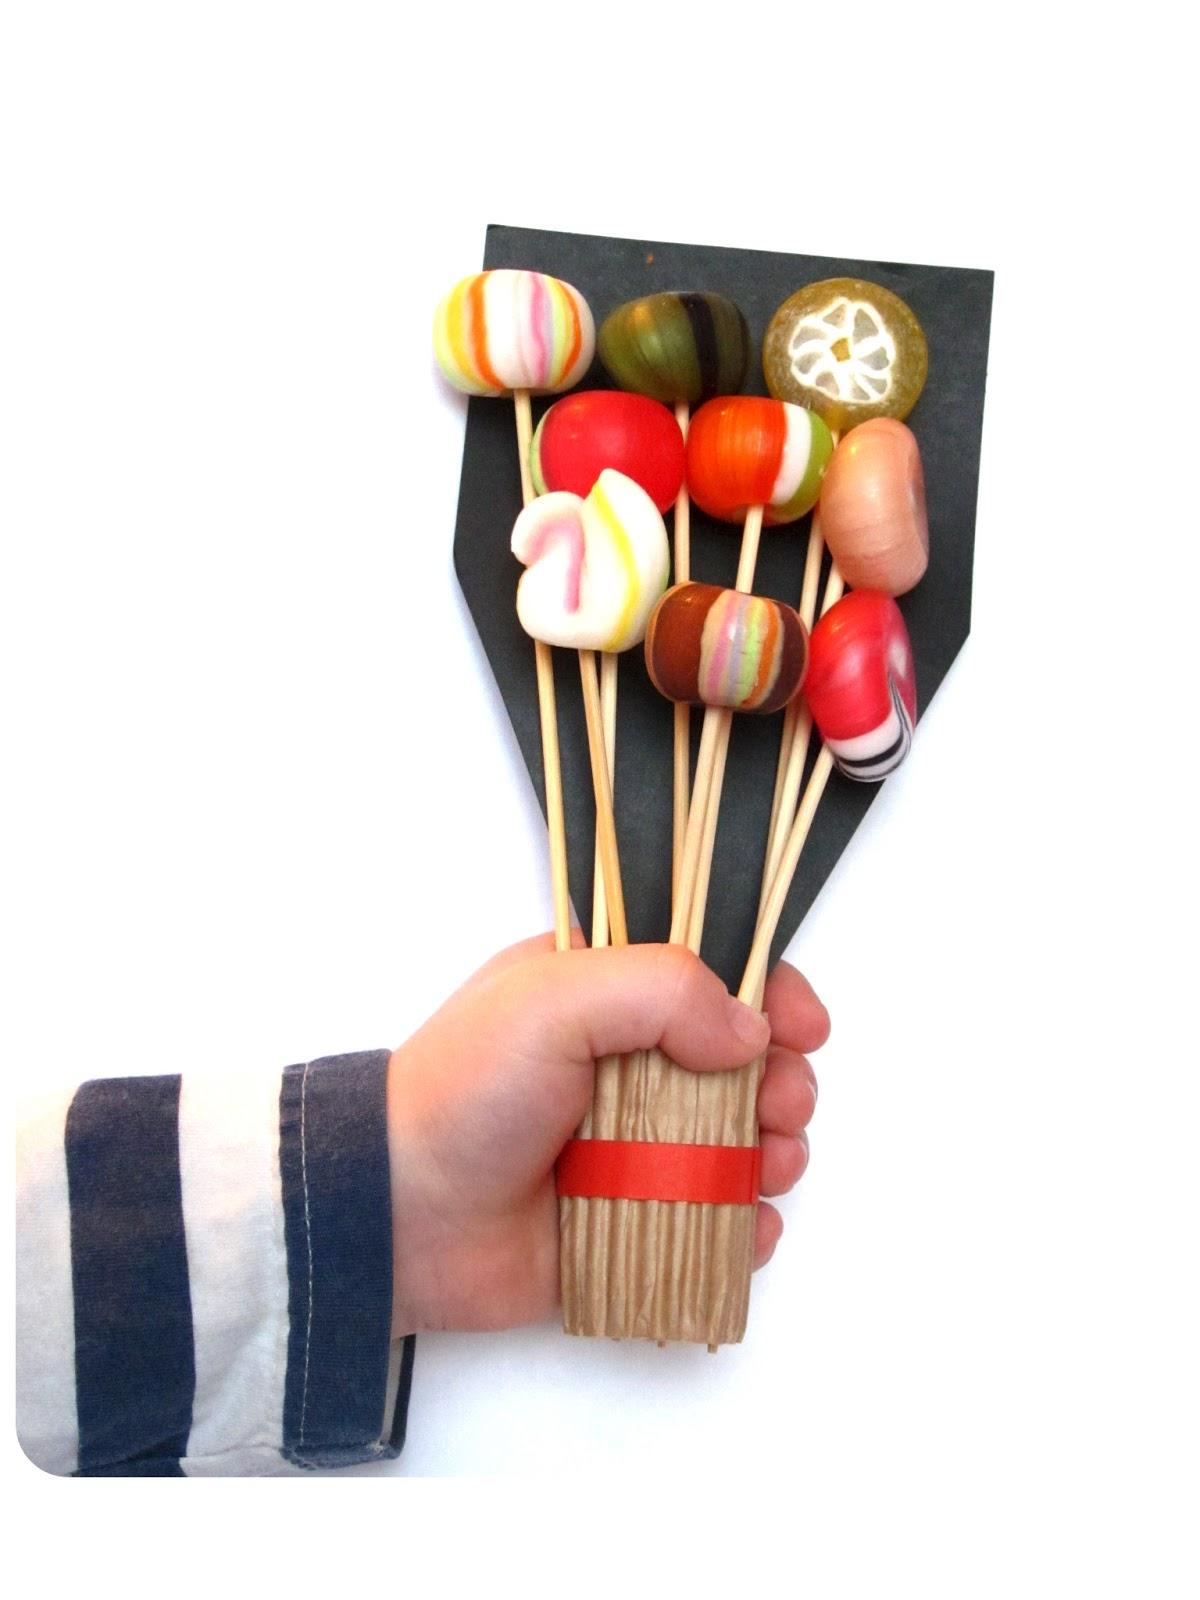 http://3.bp.blogspot.com/-2CBTW3siobo/UQi3bENmdMI/AAAAAAAACic/NKdG5MQmgGg/s1600/japanesee+lollipop+sm.jpg